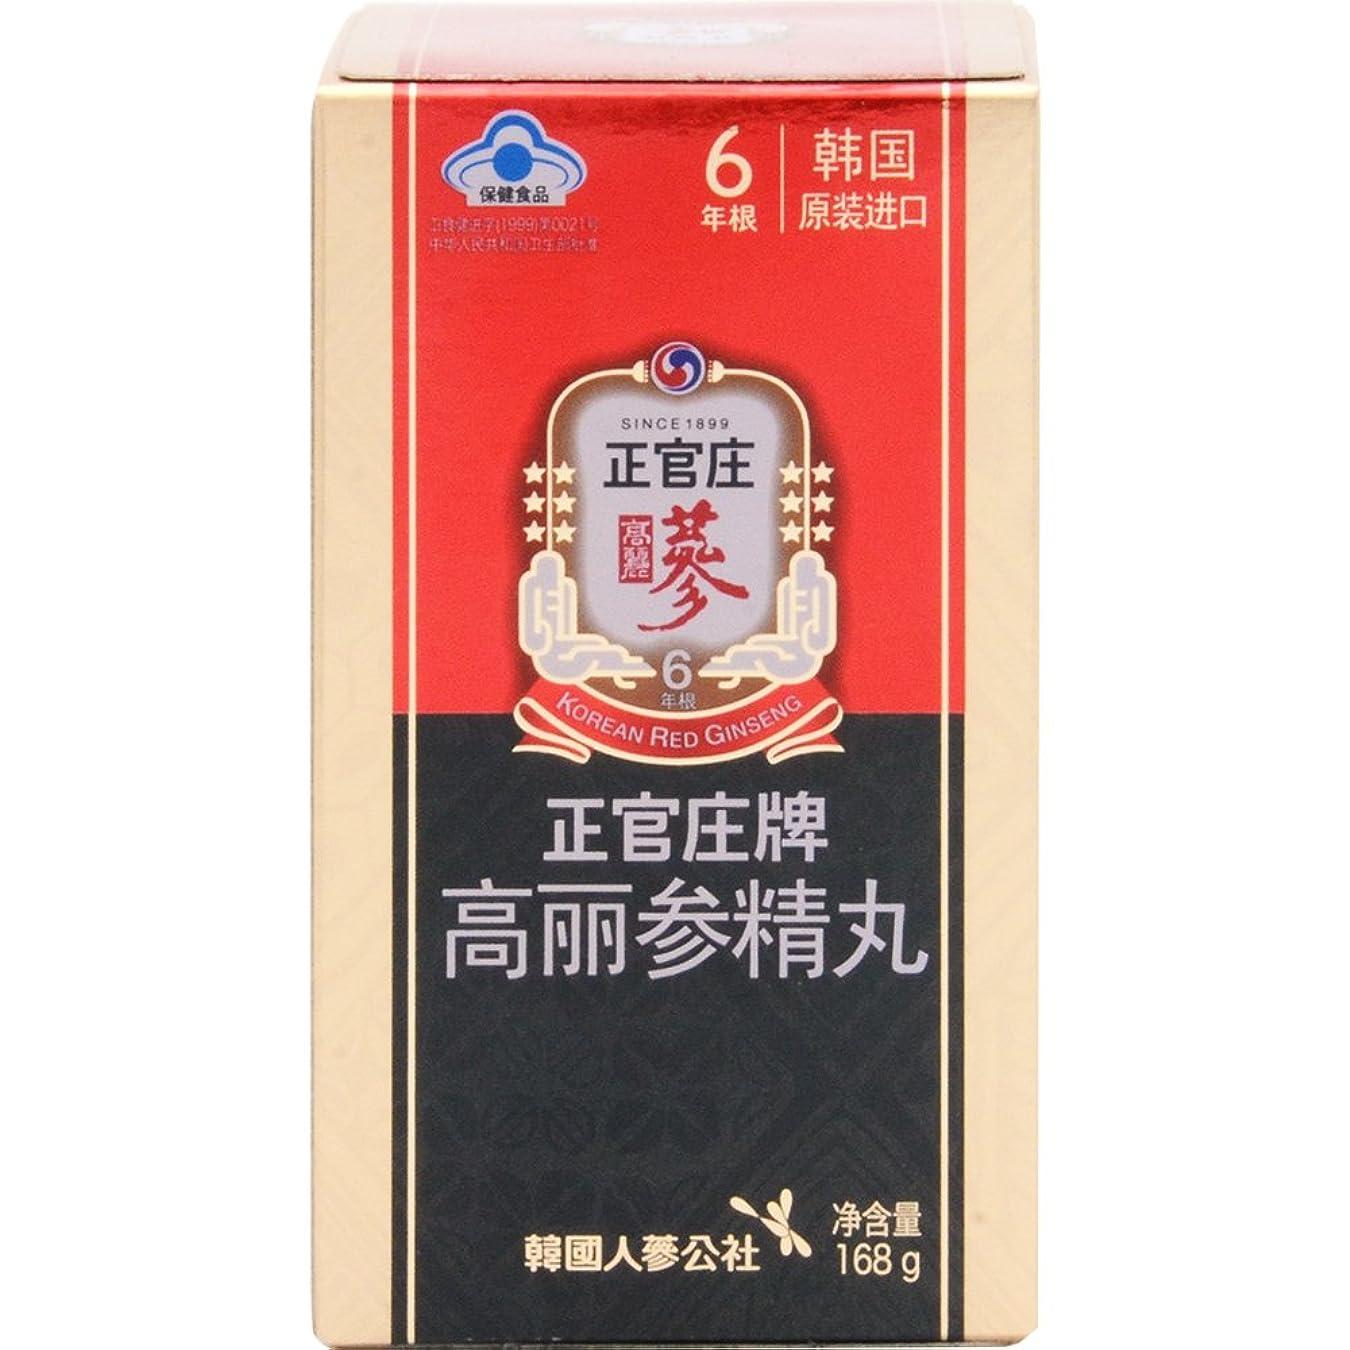 肌実現可能礼儀韓国紅参ブランド『正官庄』(6年高麗人参)紅参精丸168g(800丸入り)